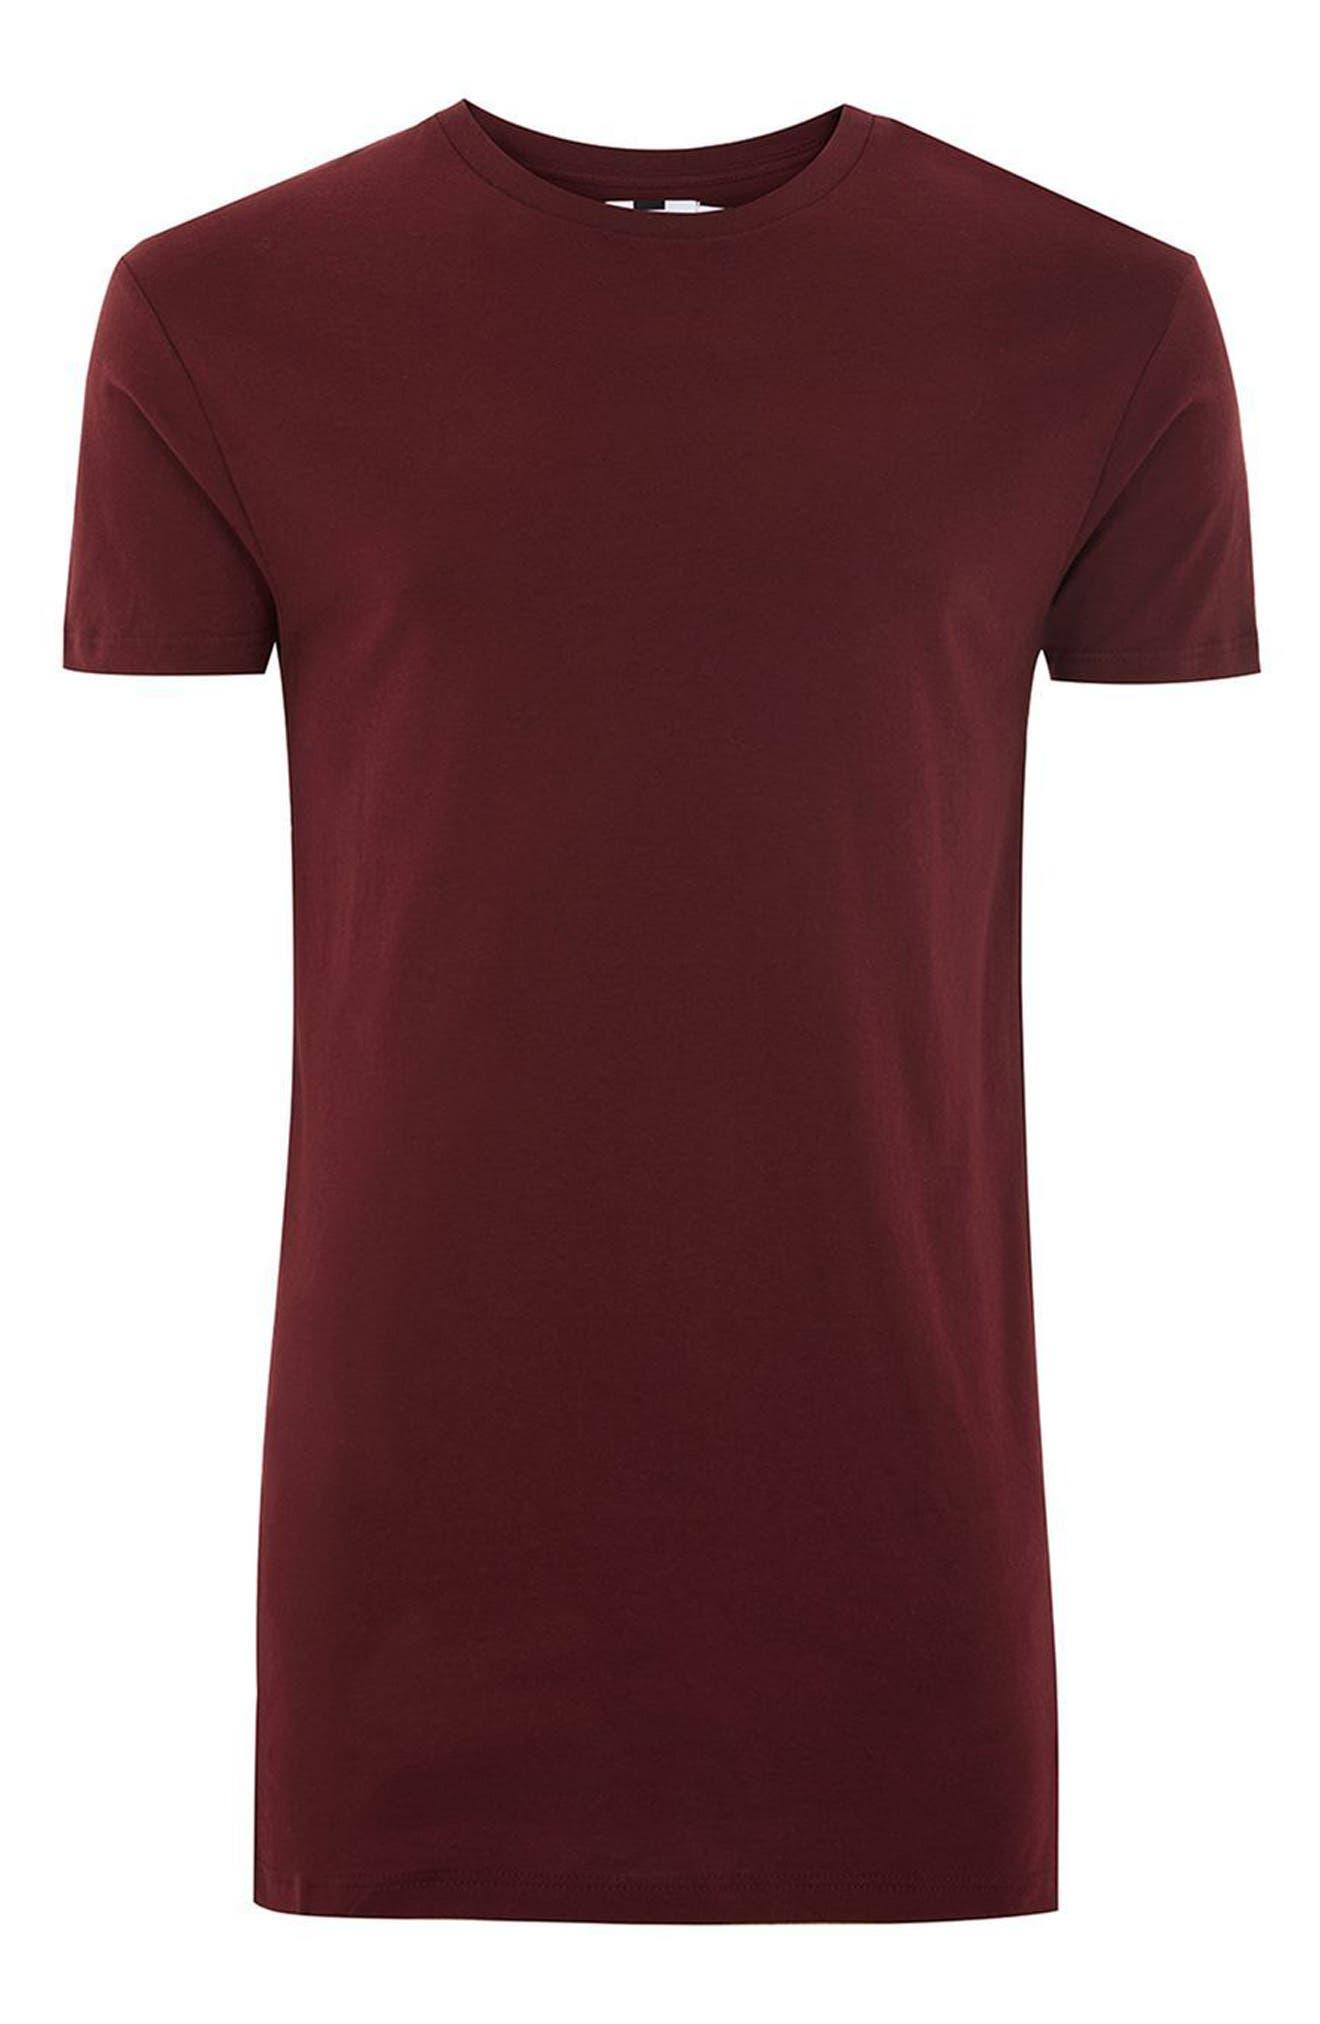 Muscle Fit Longline T-Shirt,                             Alternate thumbnail 4, color,                             Burgundy